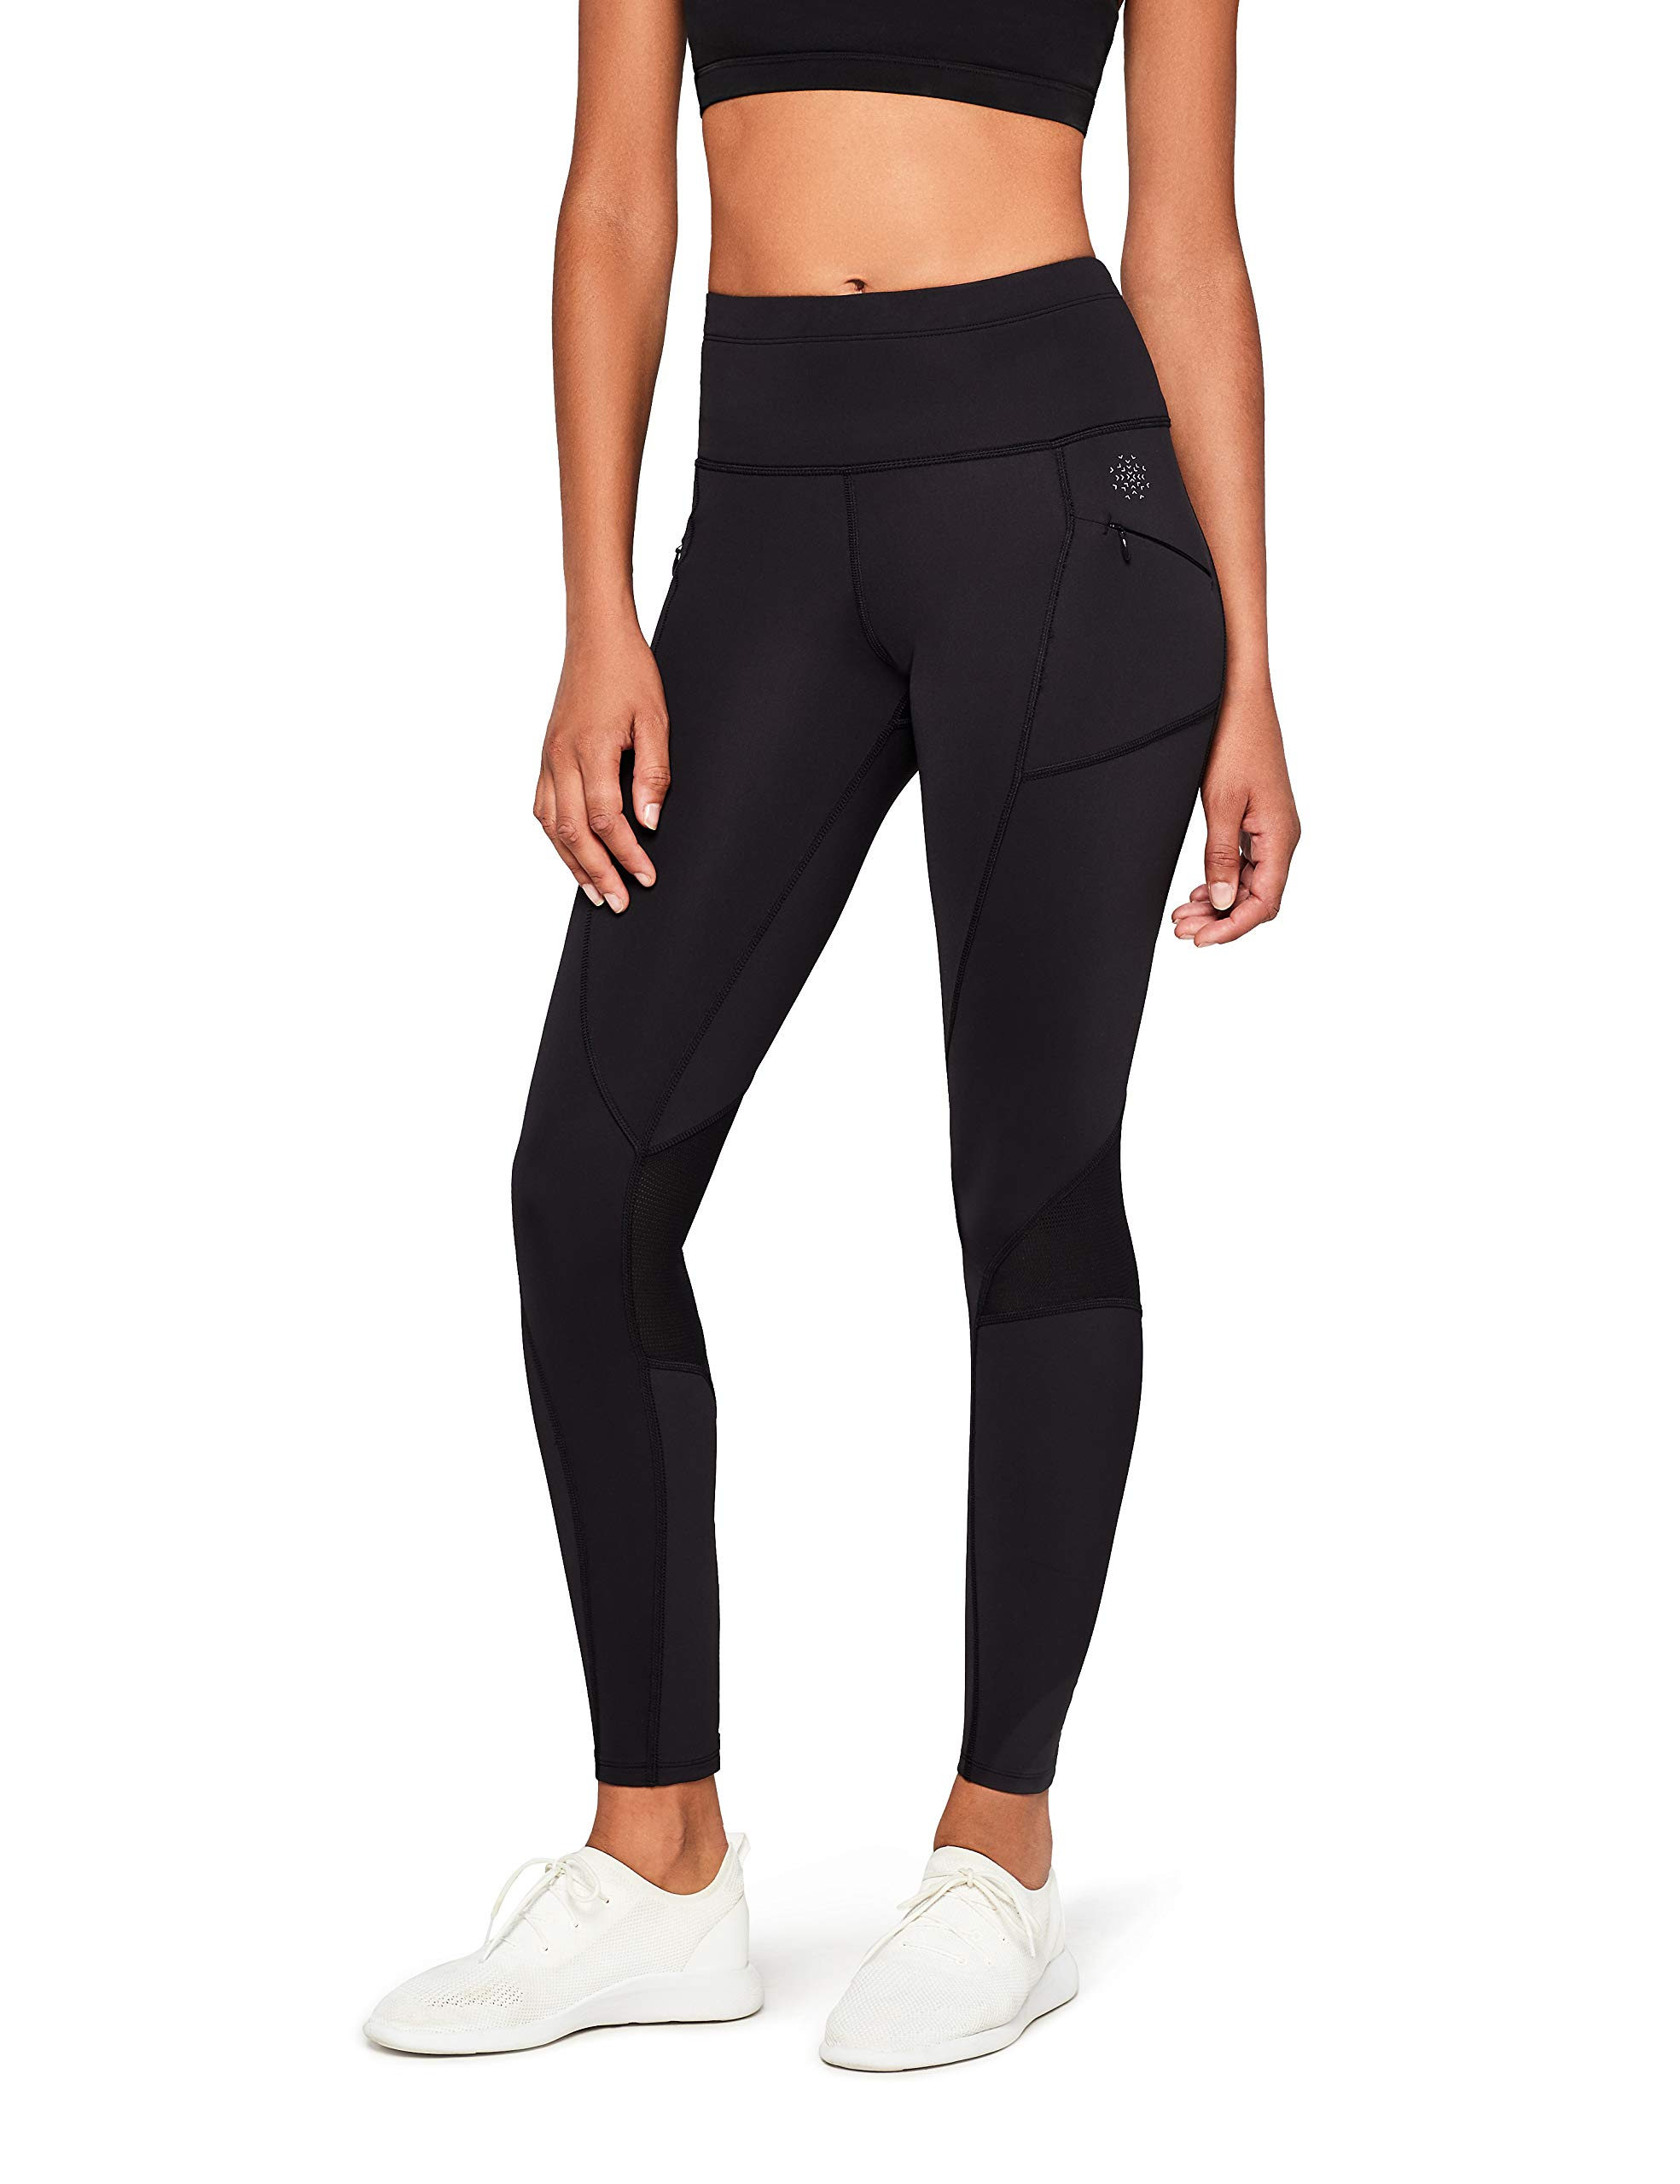 71Yf8ttz1zL - Amazon Brand - AURIQUE Women's Thermal Running Sports Leggings